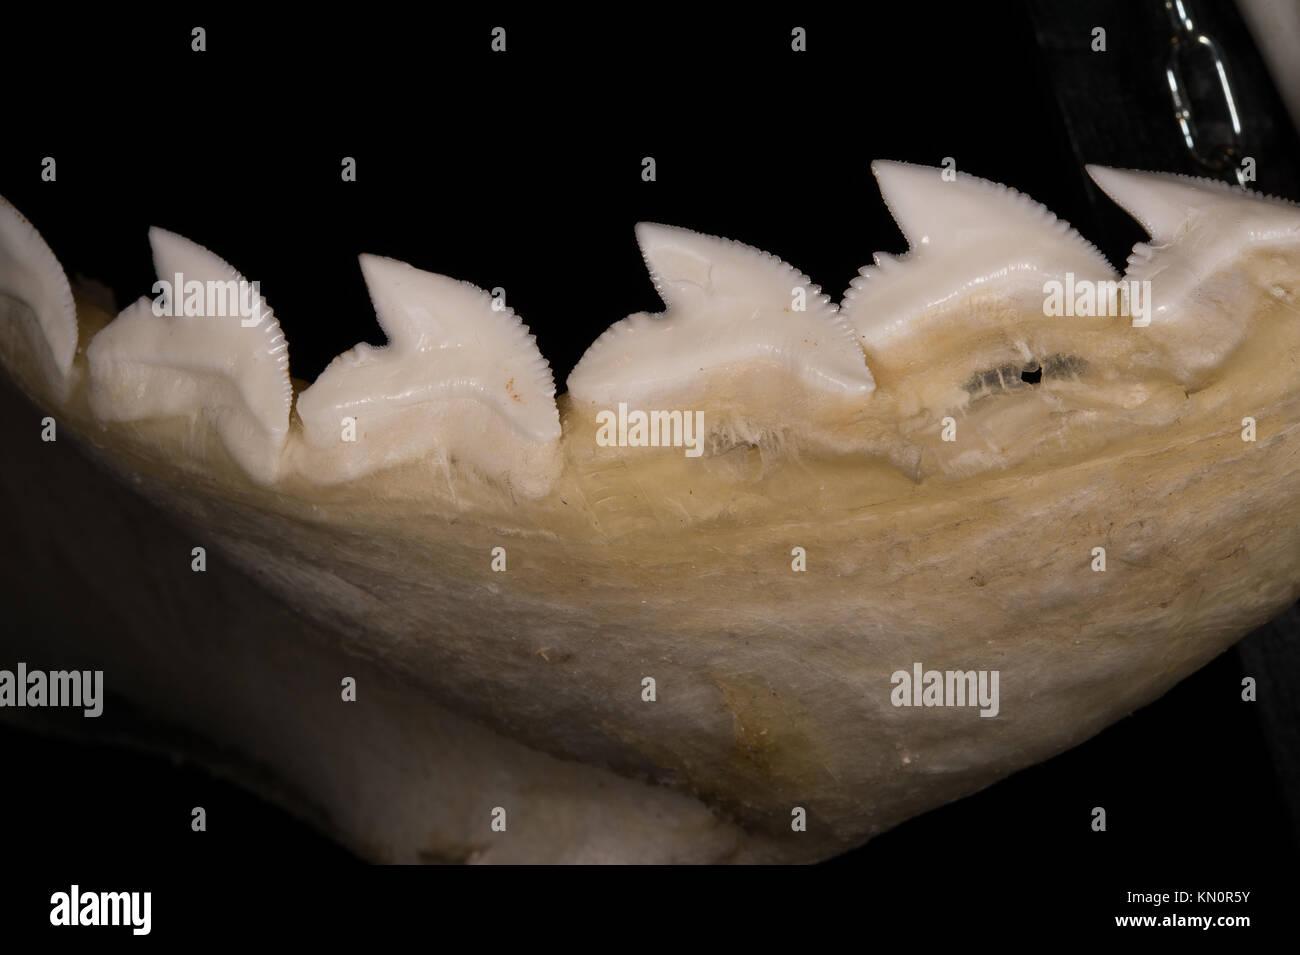 Tiger shark teeth, Galeocerdo cuvier, Carcharhinidae - Stock Image